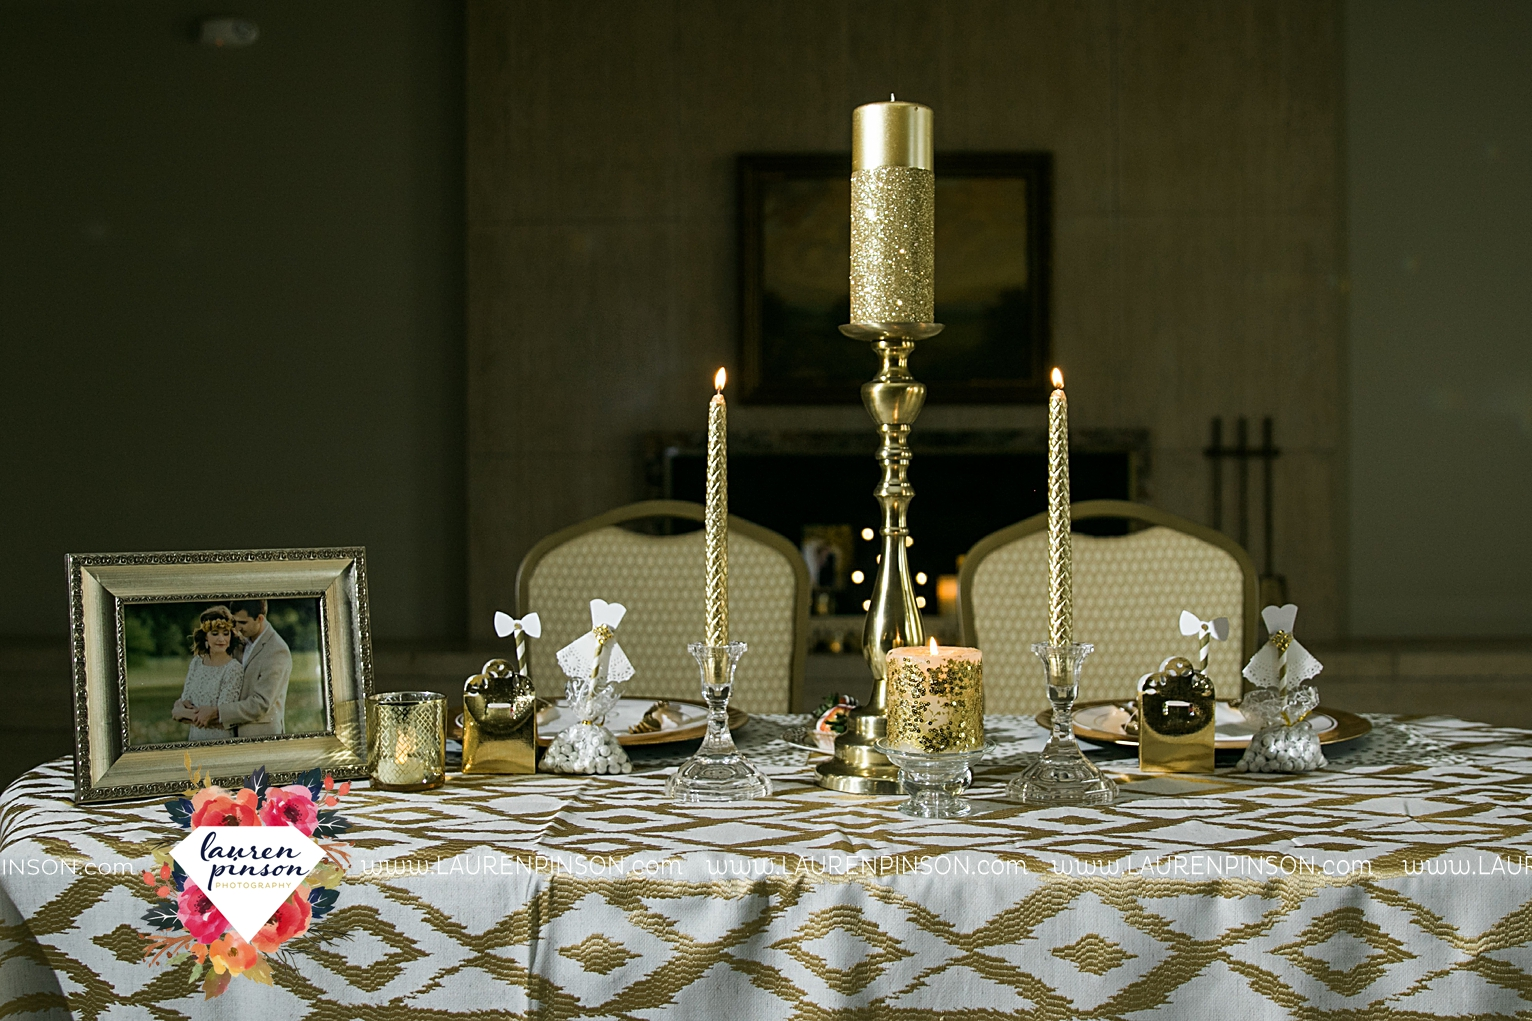 wichita-falls-texas-wedding-photographer-the-forum-by-the-kemp-mayfield-events-ulta-gold-glitter_2855.jpg